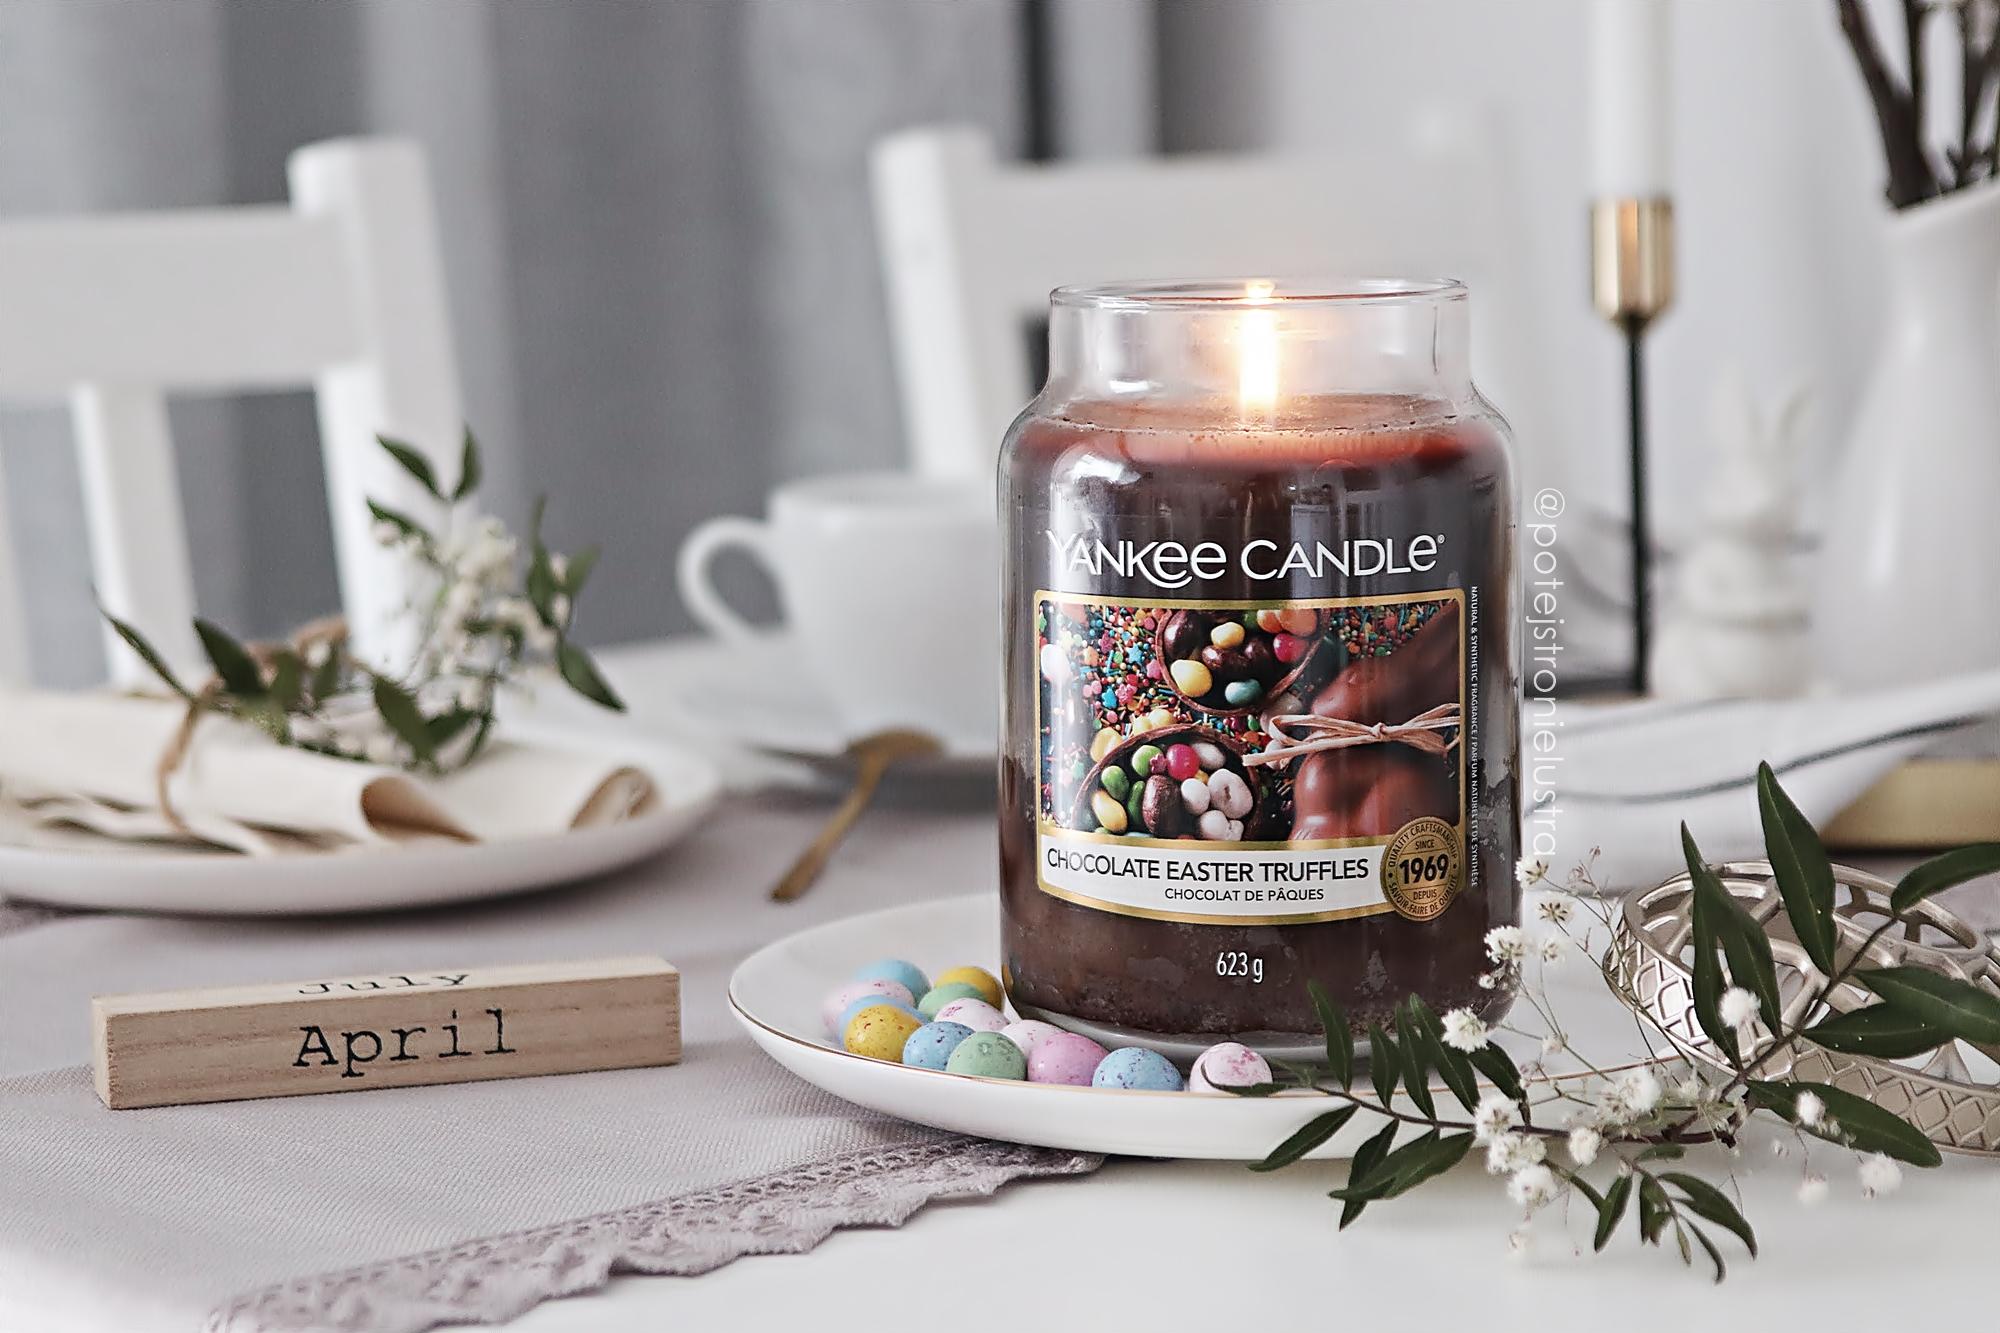 Chocolate Easter Truffles - limitowany zapach Yankee Candle na Wielkanoc 2021